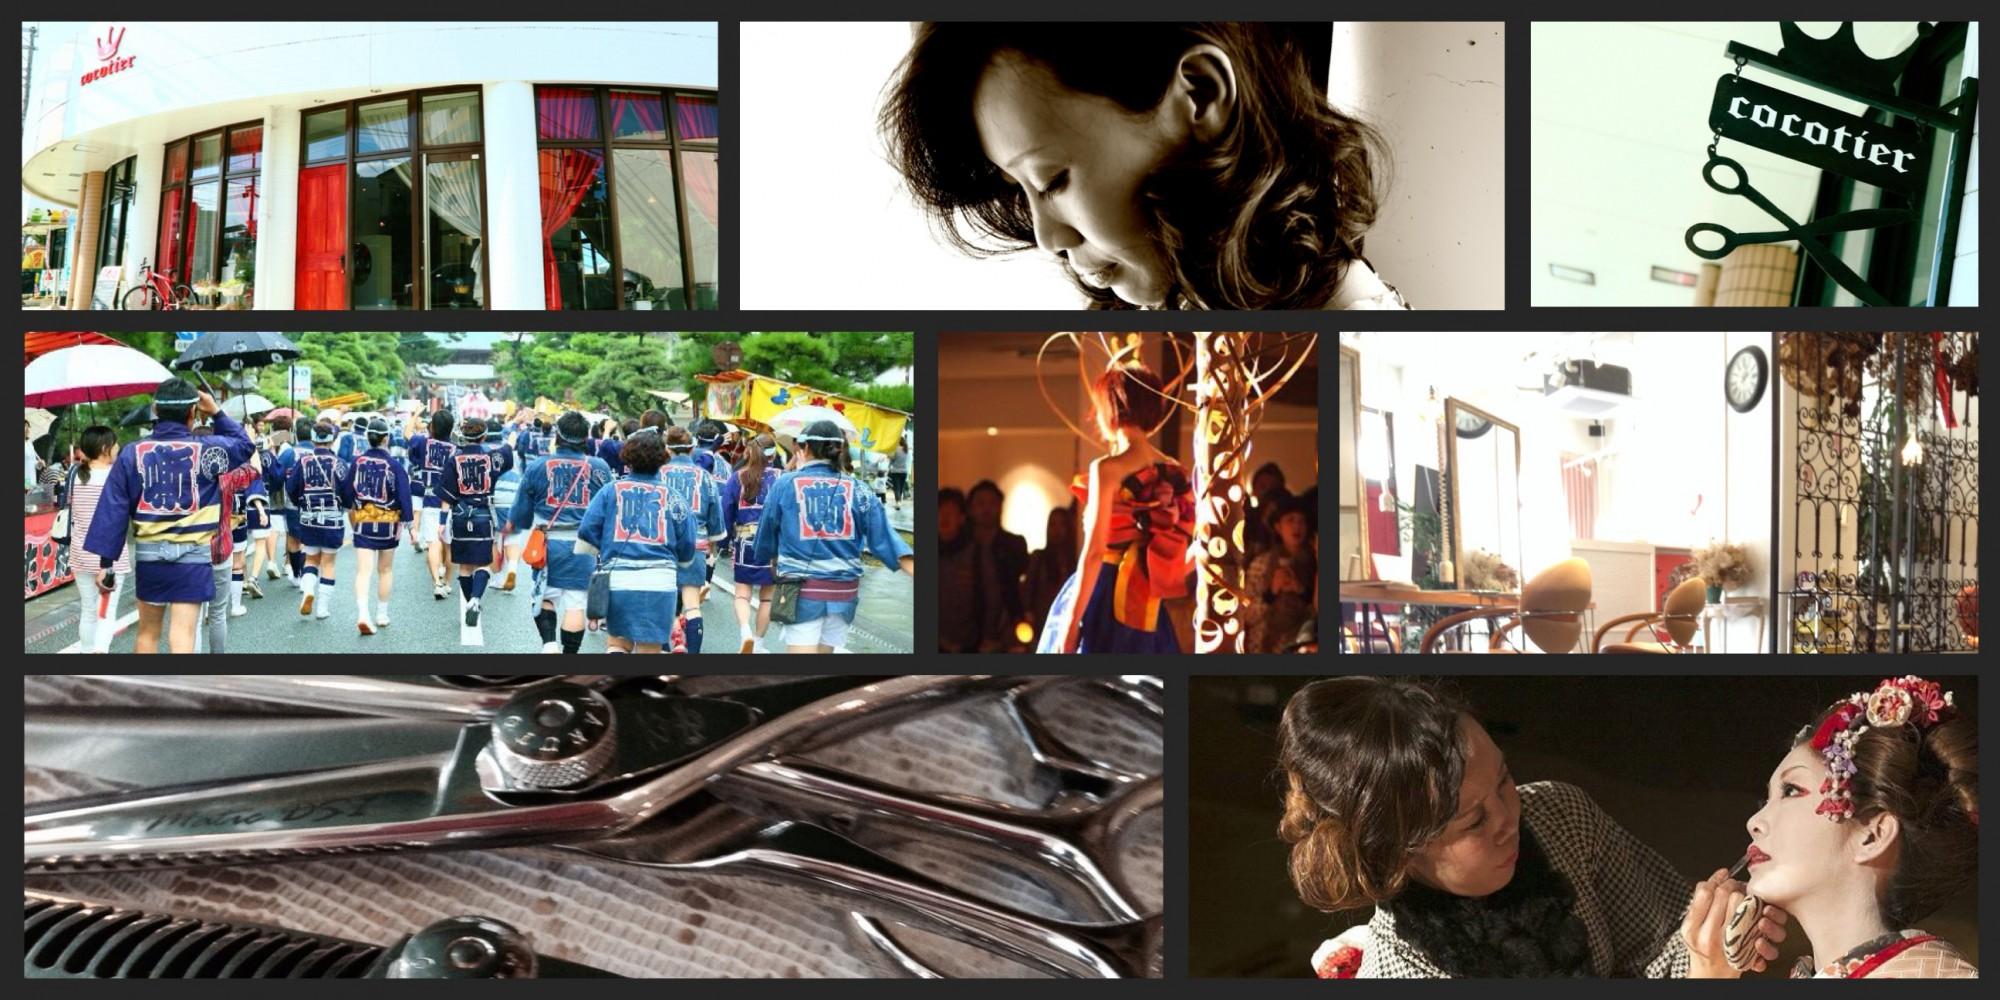 COCOTIER ココティエ 熊本市中央区子飼 美容室  ホームページ